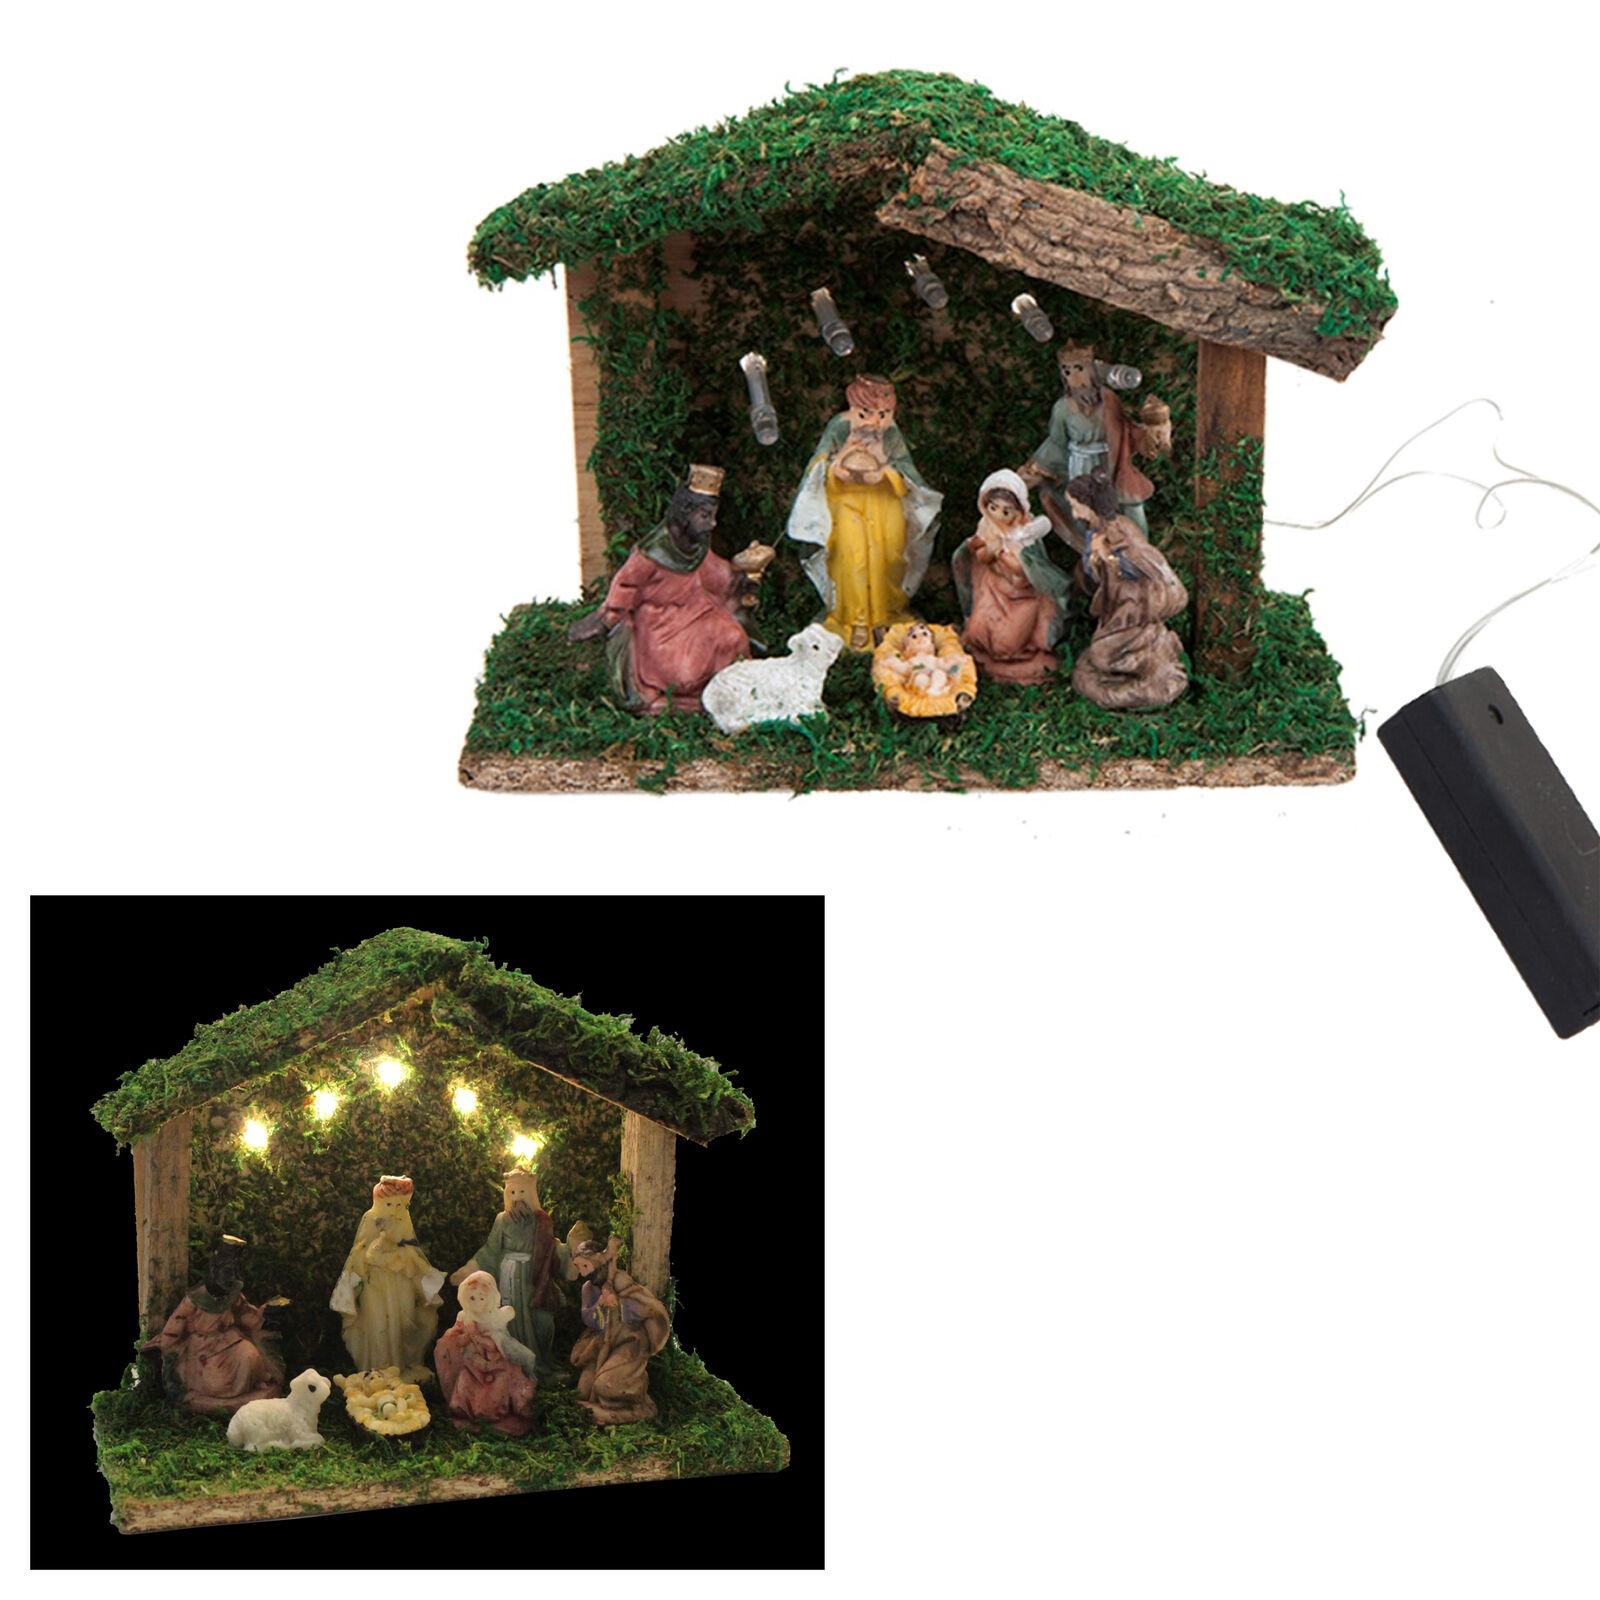 Snow White 519005 Medium Light Up Nativity Scene 7 Piece For Sale Online Ebay